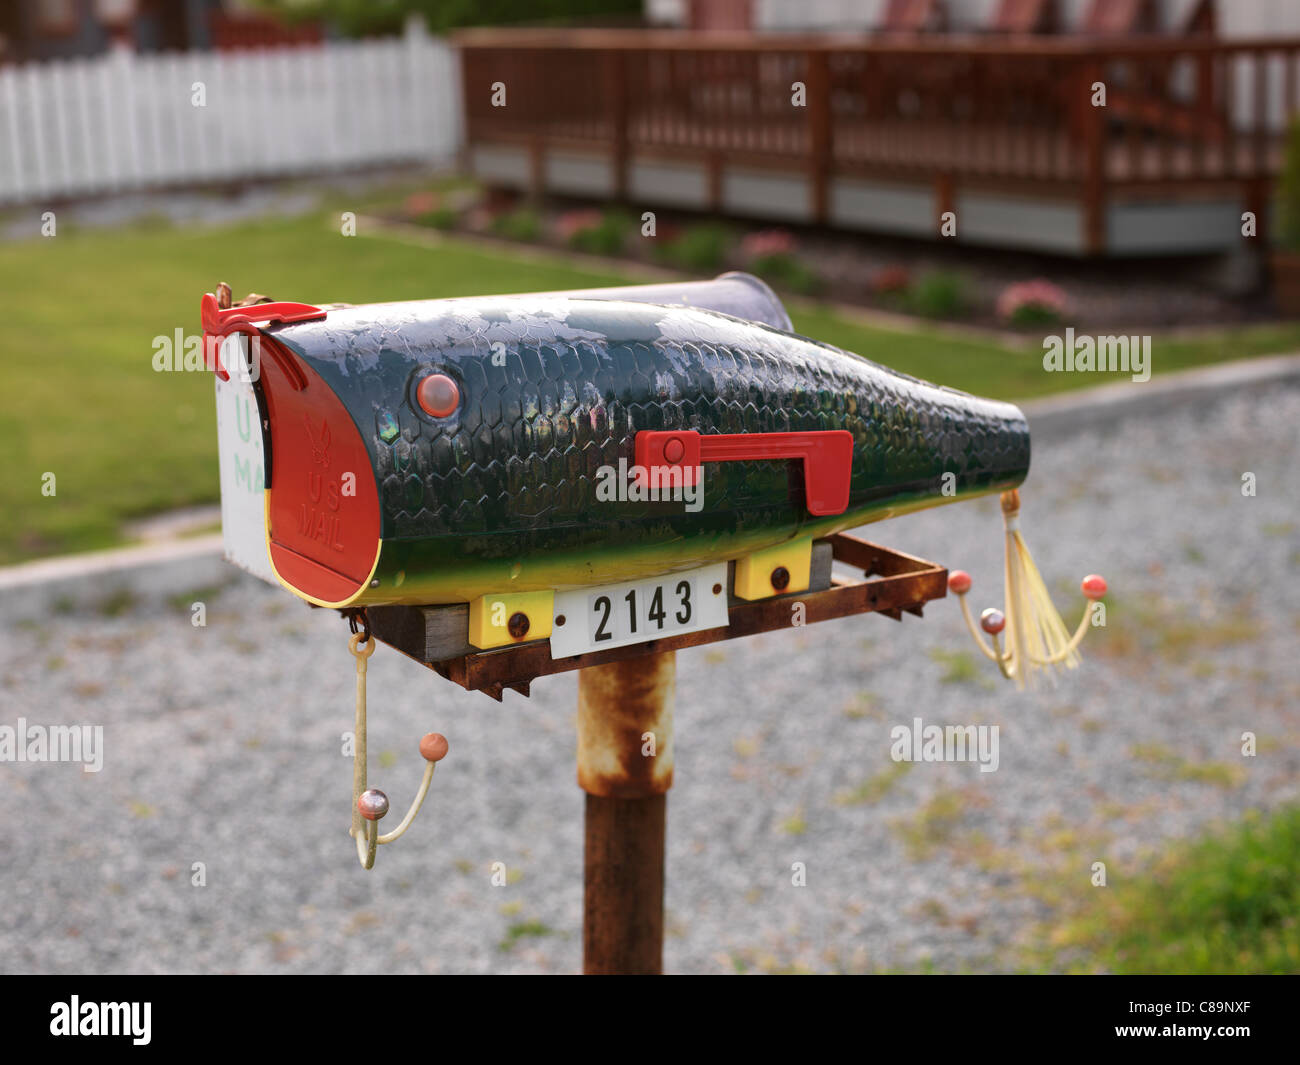 Mailbox shaped like a fish - Stock Image